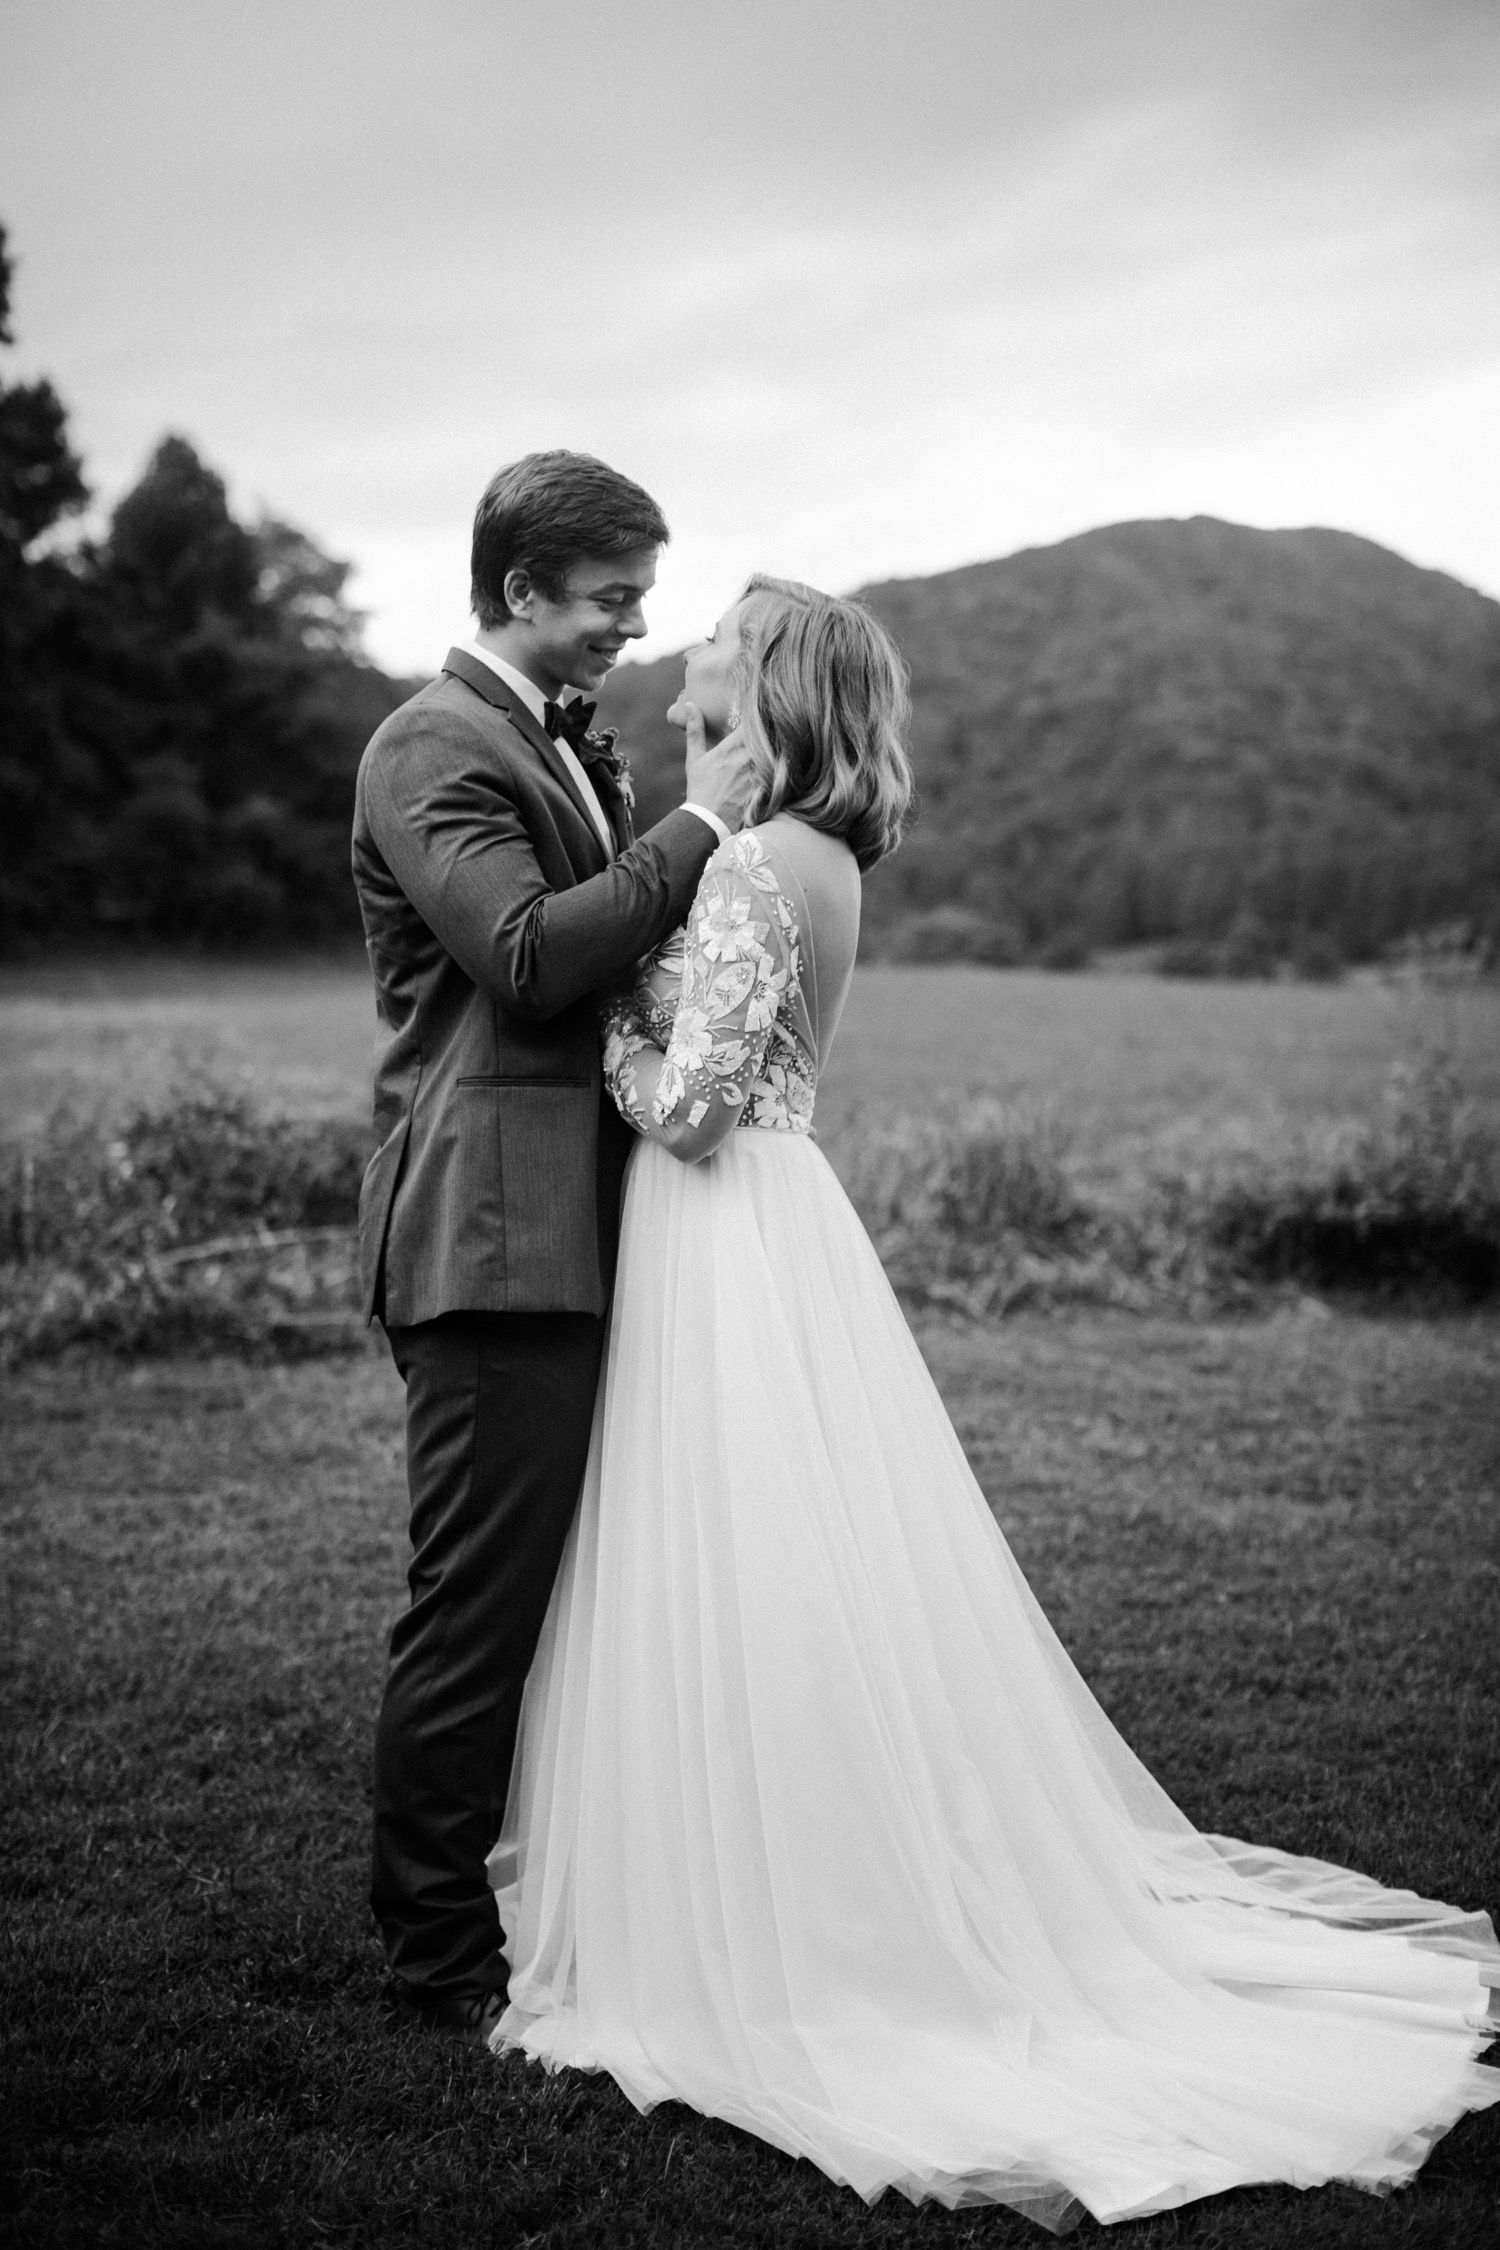 Sundara Wedding Venue In Roanoke Va Wedding Portraits In 2020 Wedding Venues Wedding Portraits Va Wedding